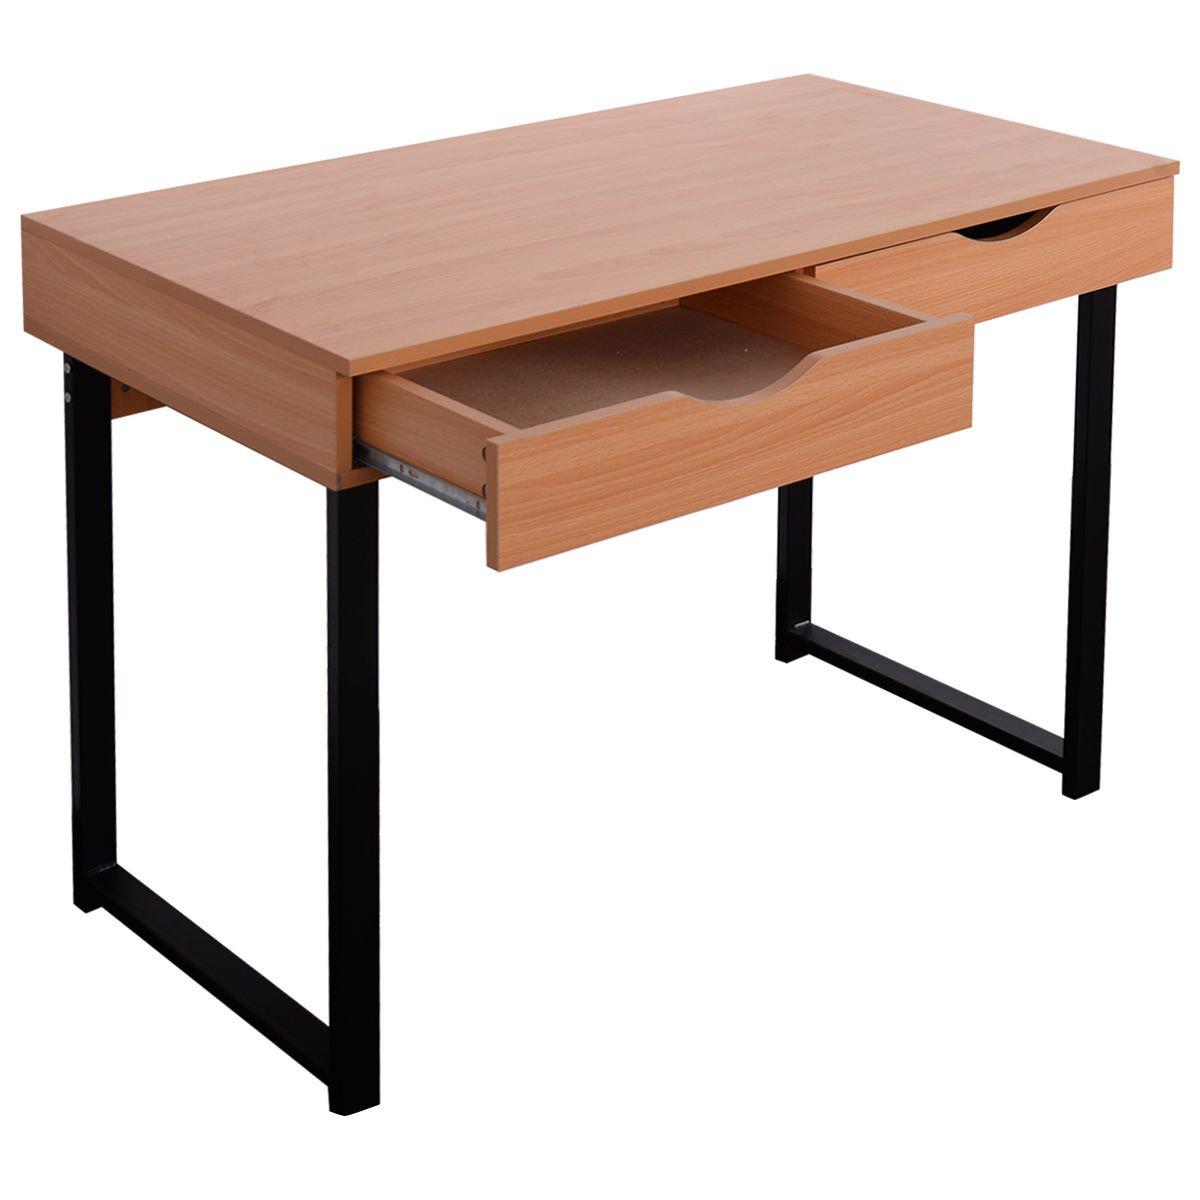 TANGKULA Computer Desk Laptop Writing Desk Student Study Desk Modern Simple Style Home Office Desk Large Size PC Laptop Study Table Workstation Writing Desk for Home and Office (Wood)